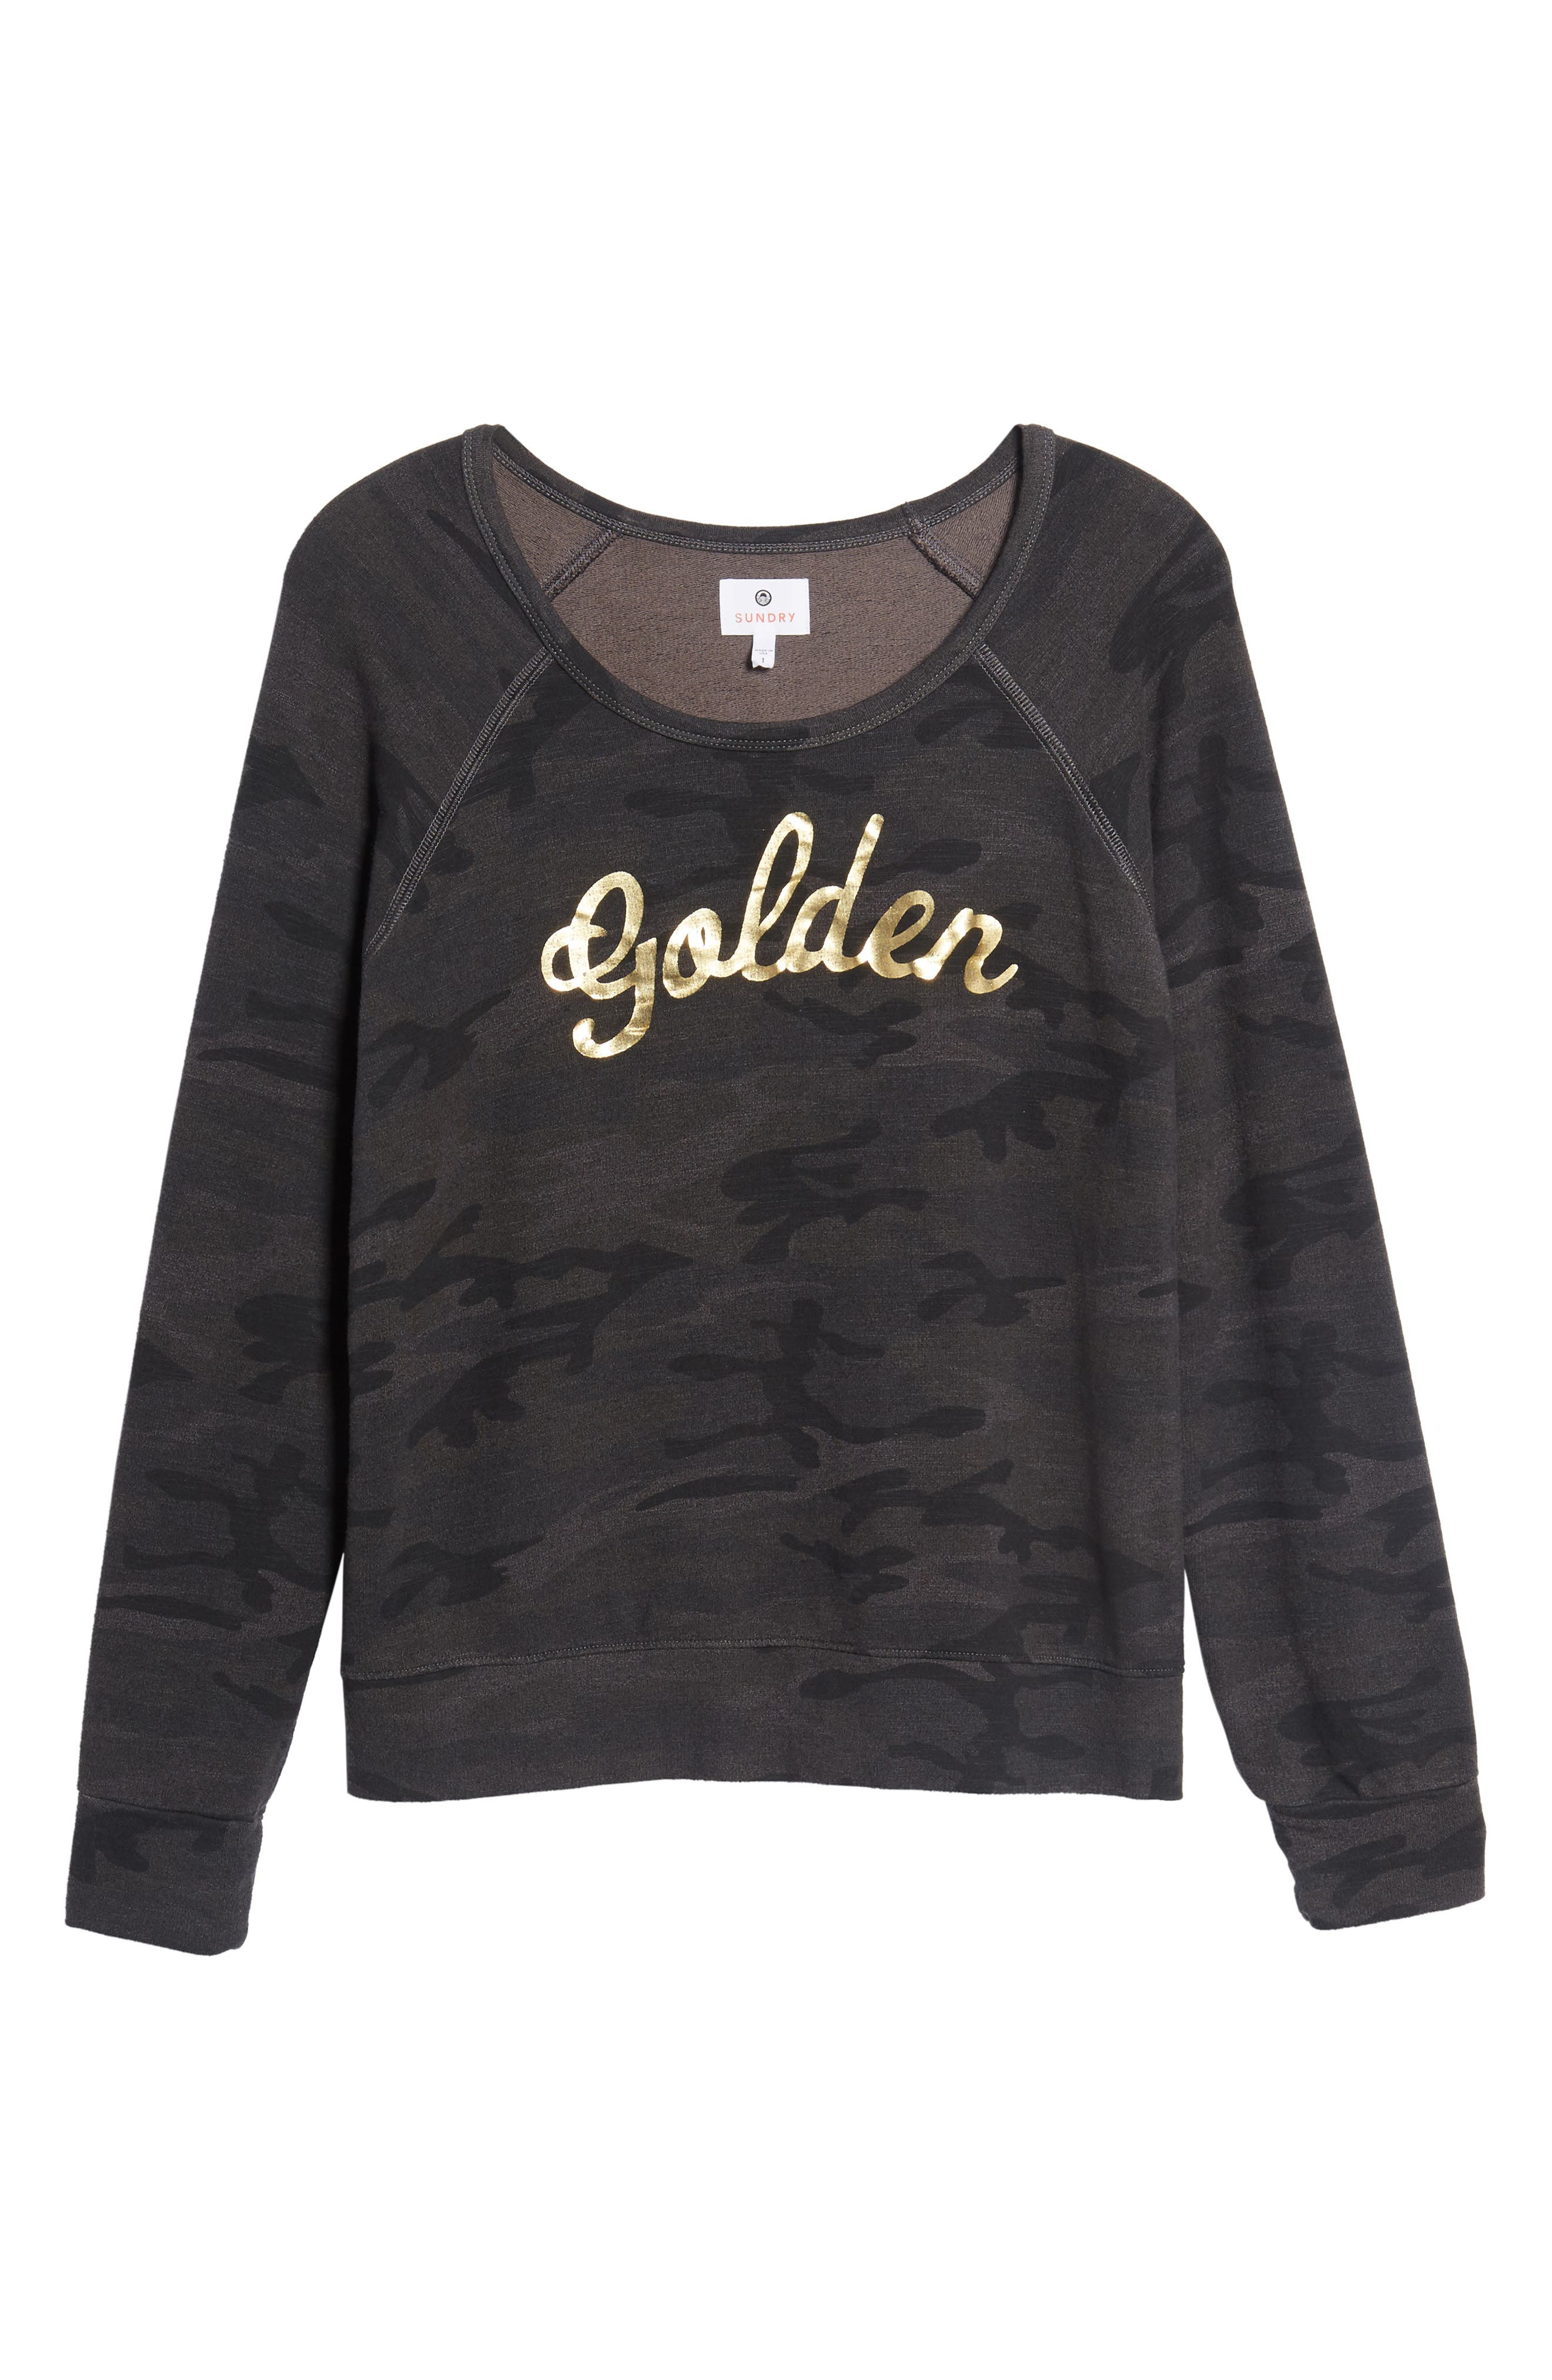 Active Golden Sweatshirt,                             Alternate thumbnail 6, color,                             Charcoal